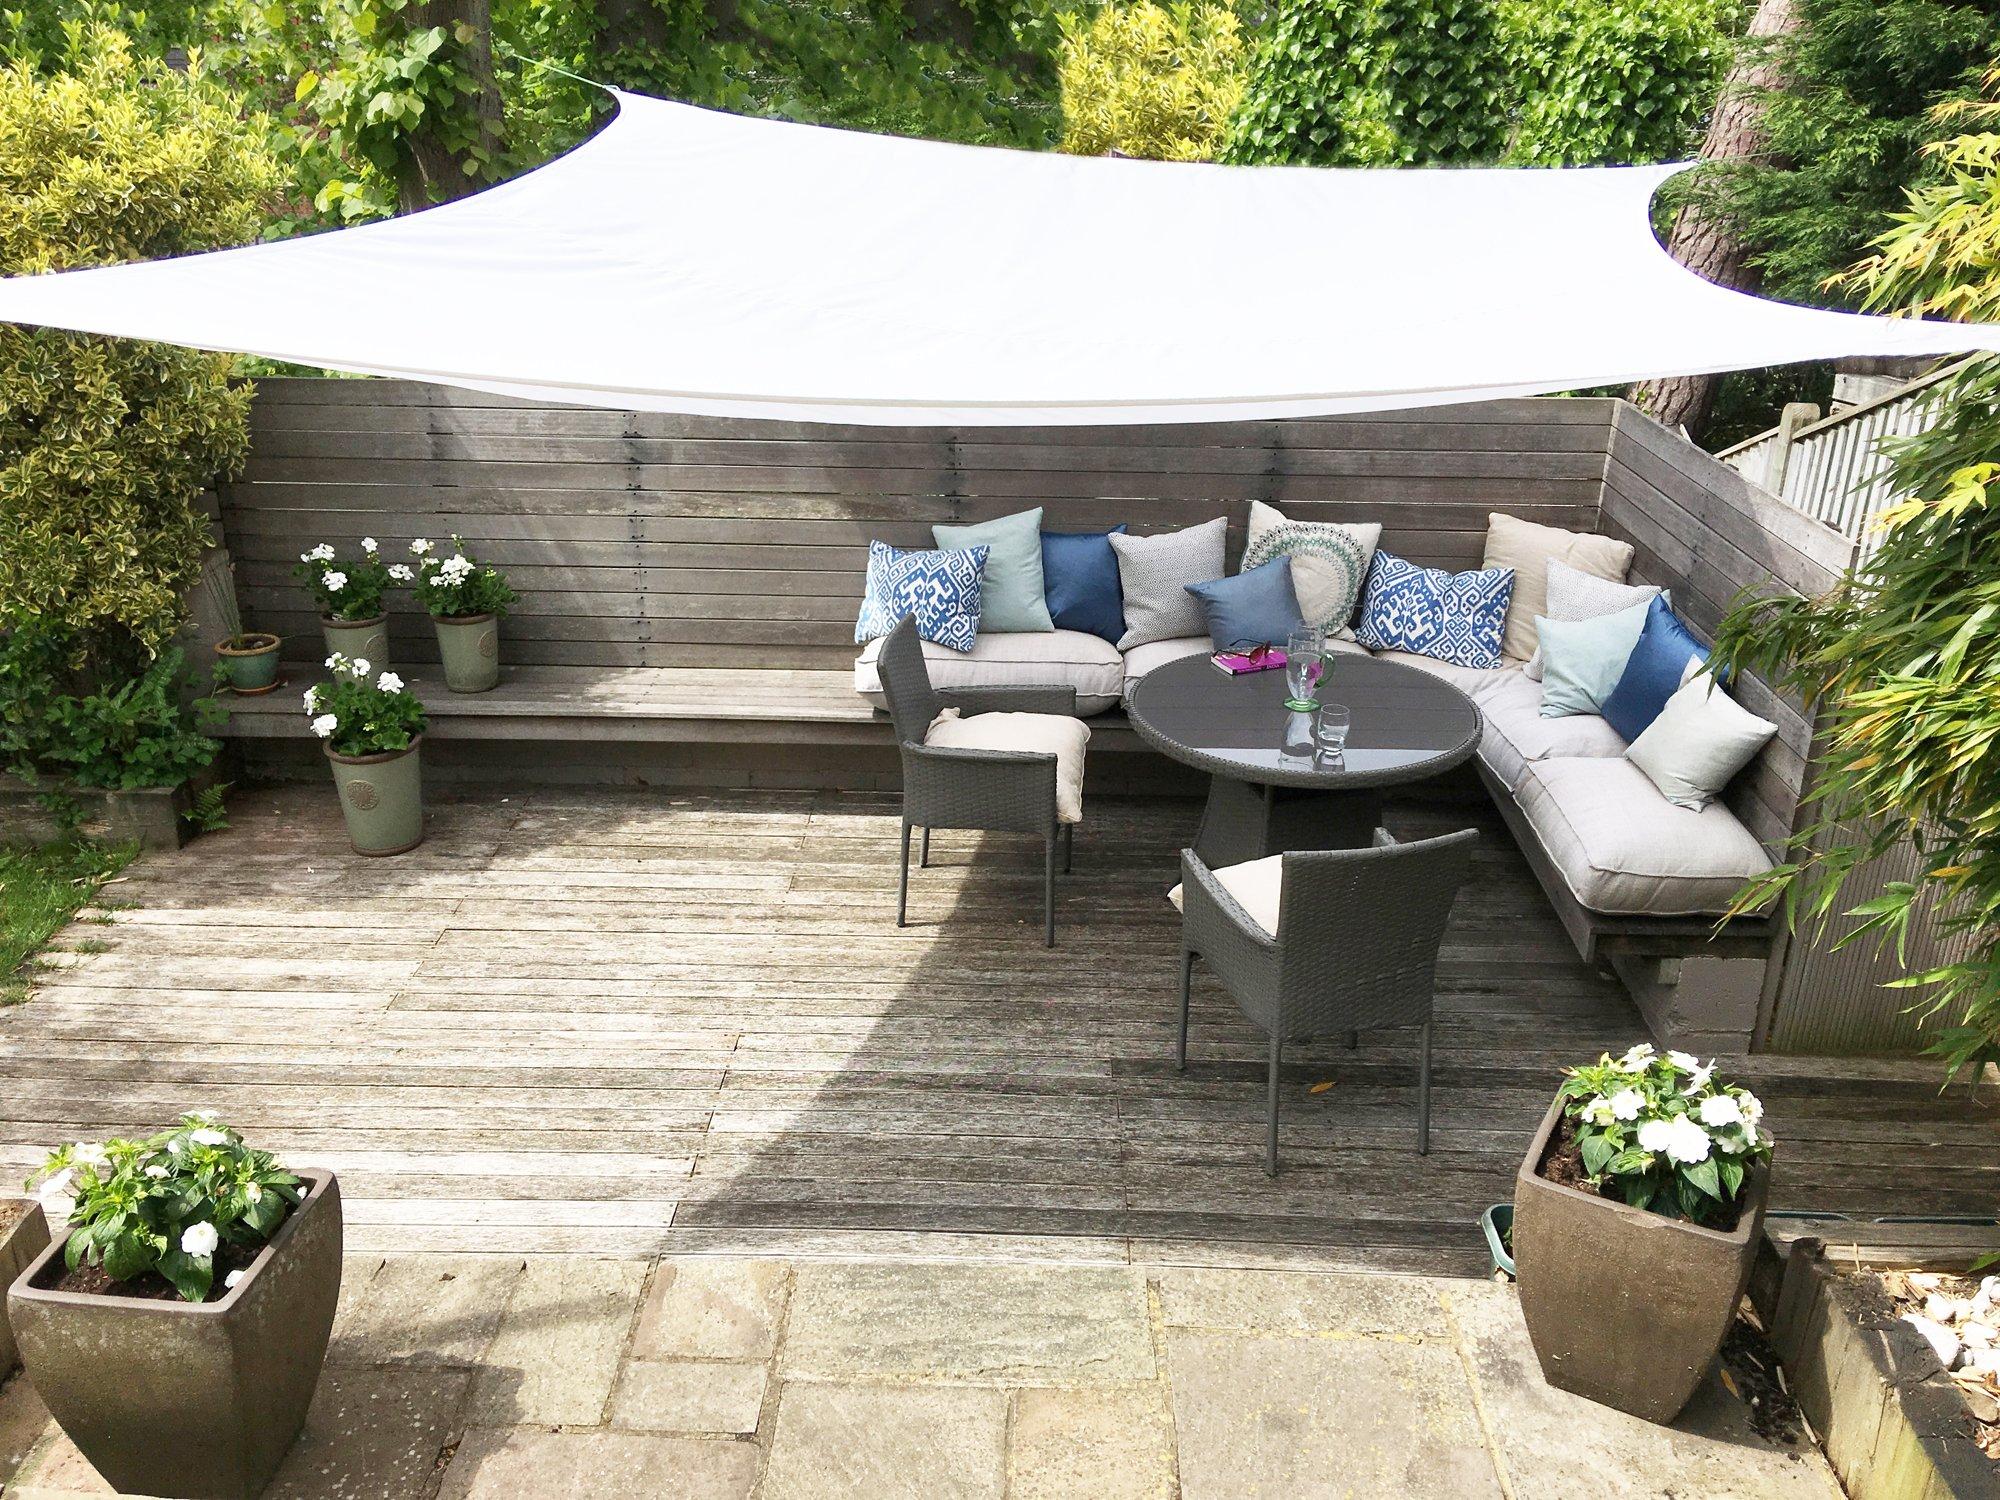 sun shades for garden. Black Bedroom Furniture Sets. Home Design Ideas